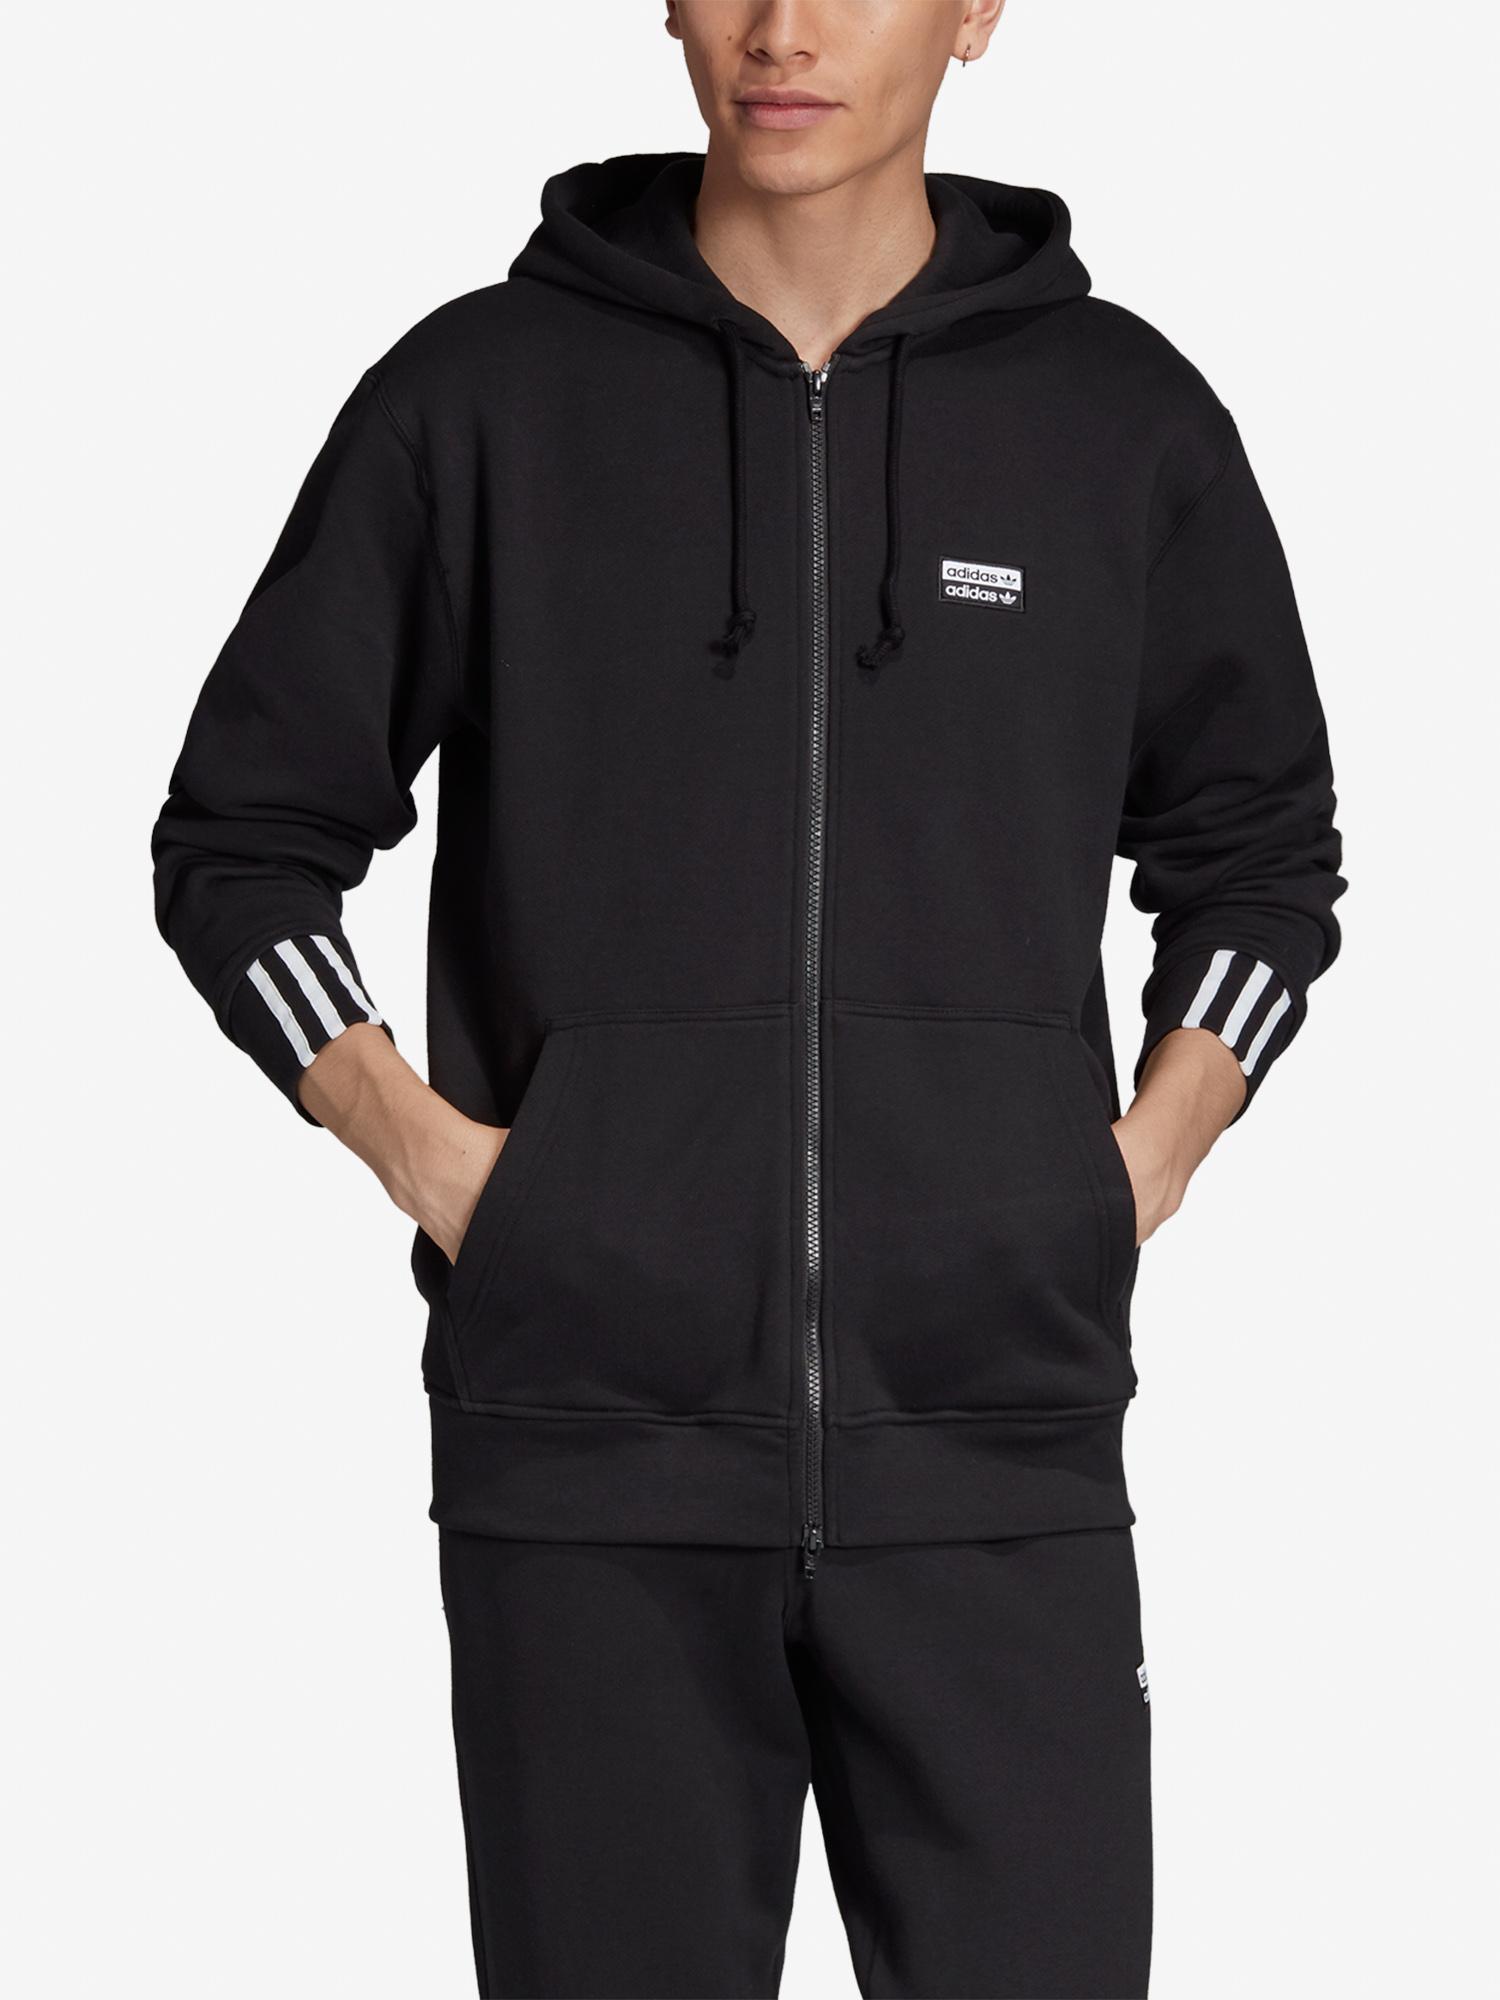 Adidas Originals R.Y.V. Fz Hoody Sweatshirt